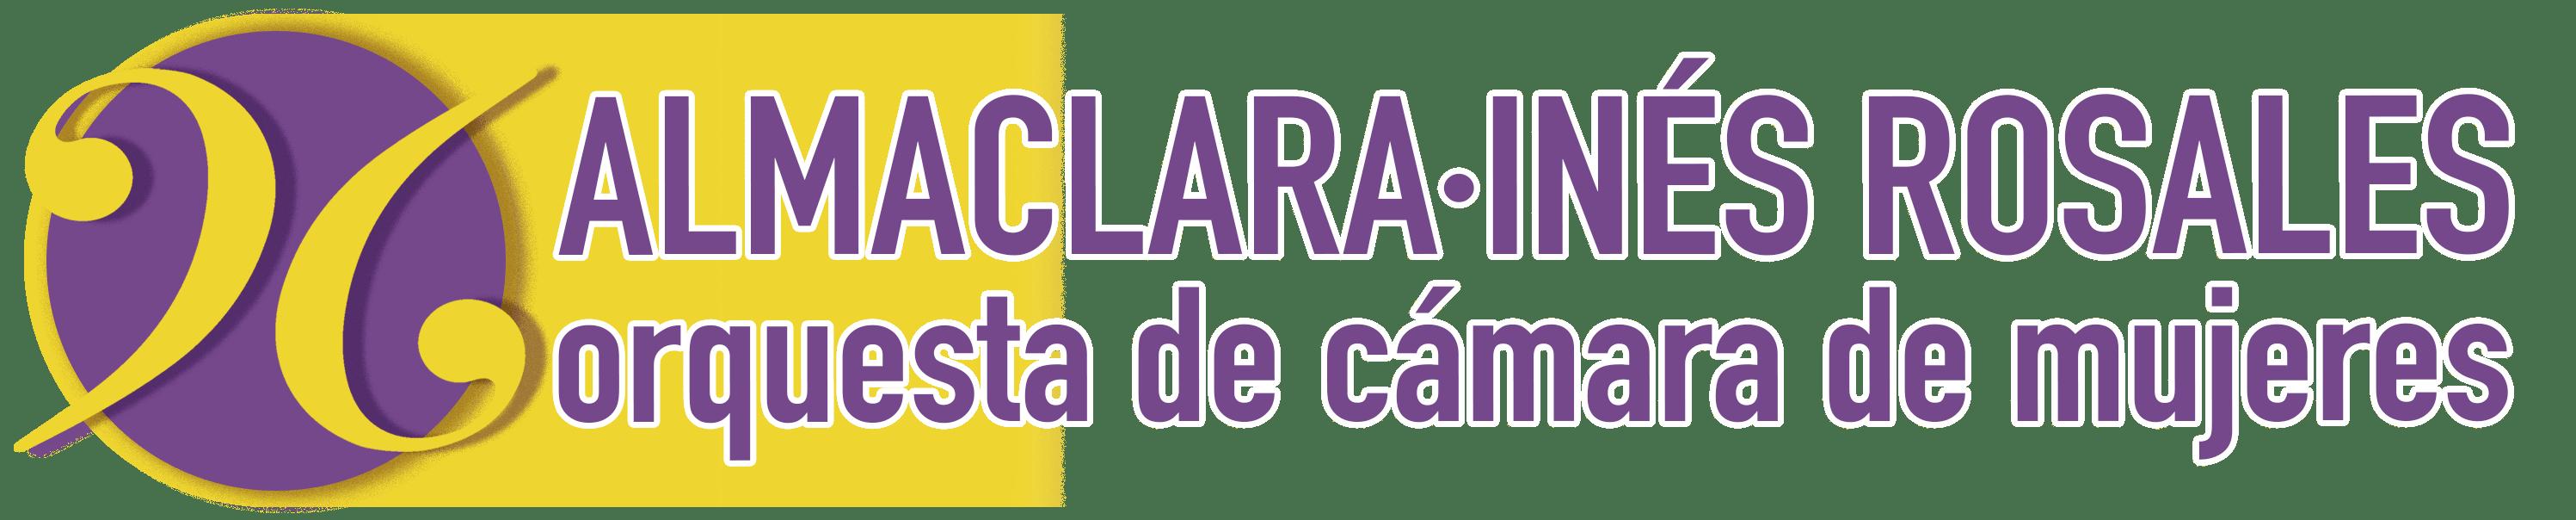 almaclara.es